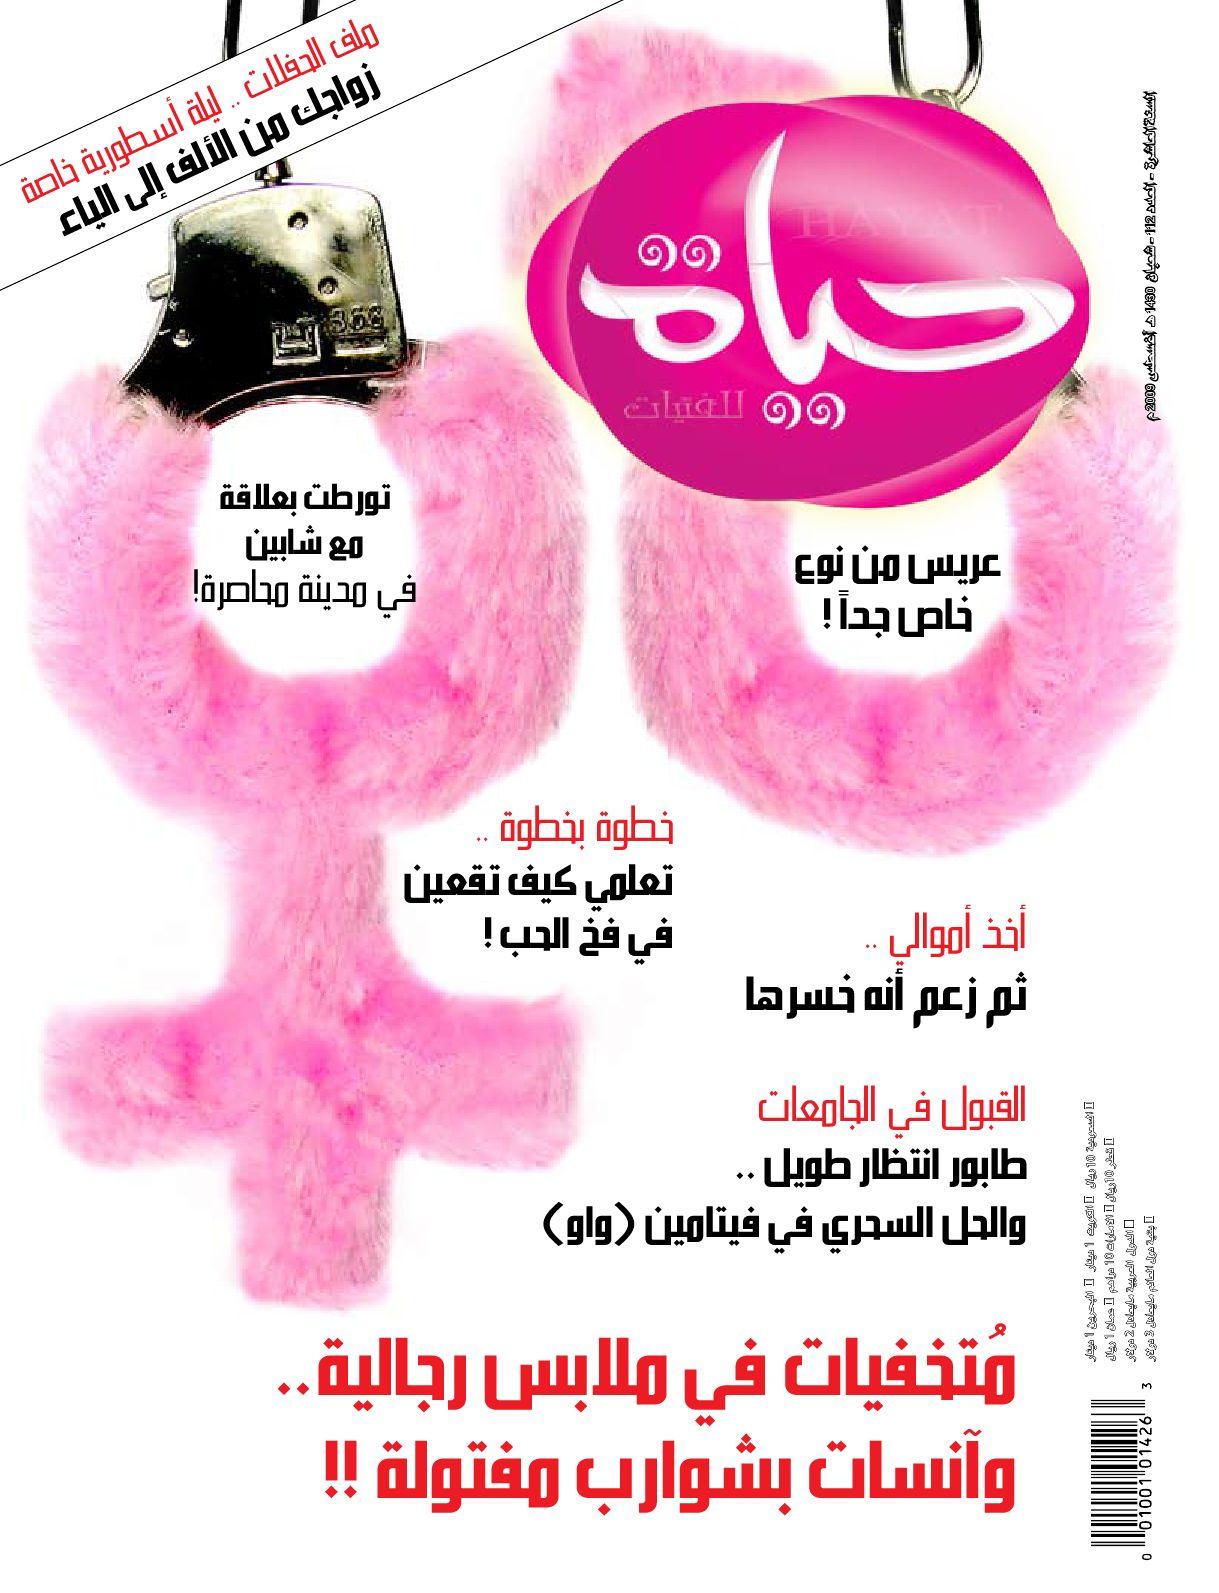 e15664f9d9a2b Hayat magazine by Awad Alradi - Graphic designer - issuu